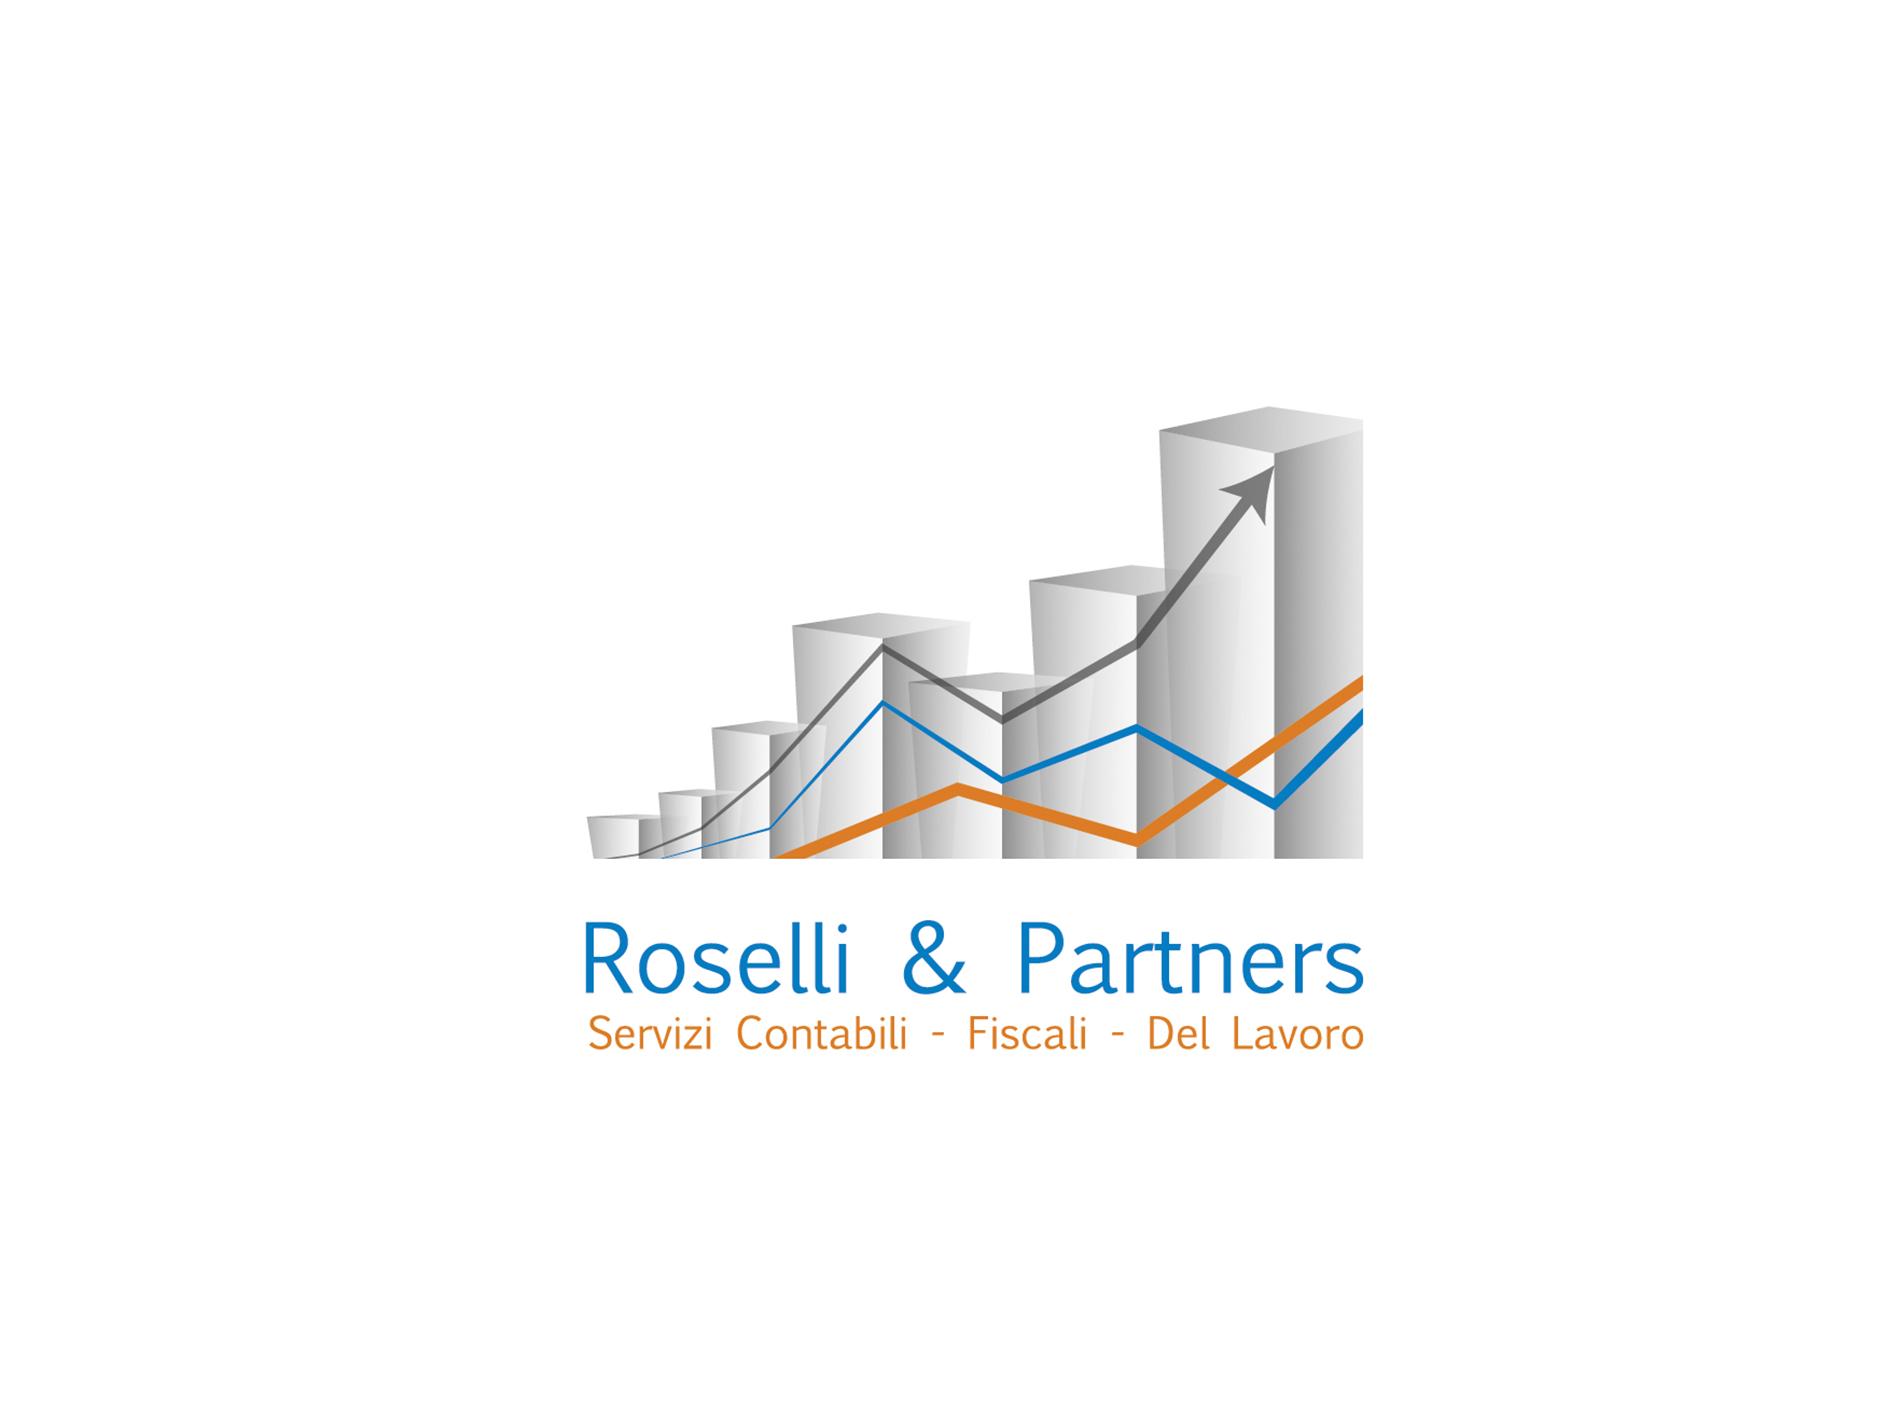 Roselli&Partners Marchio